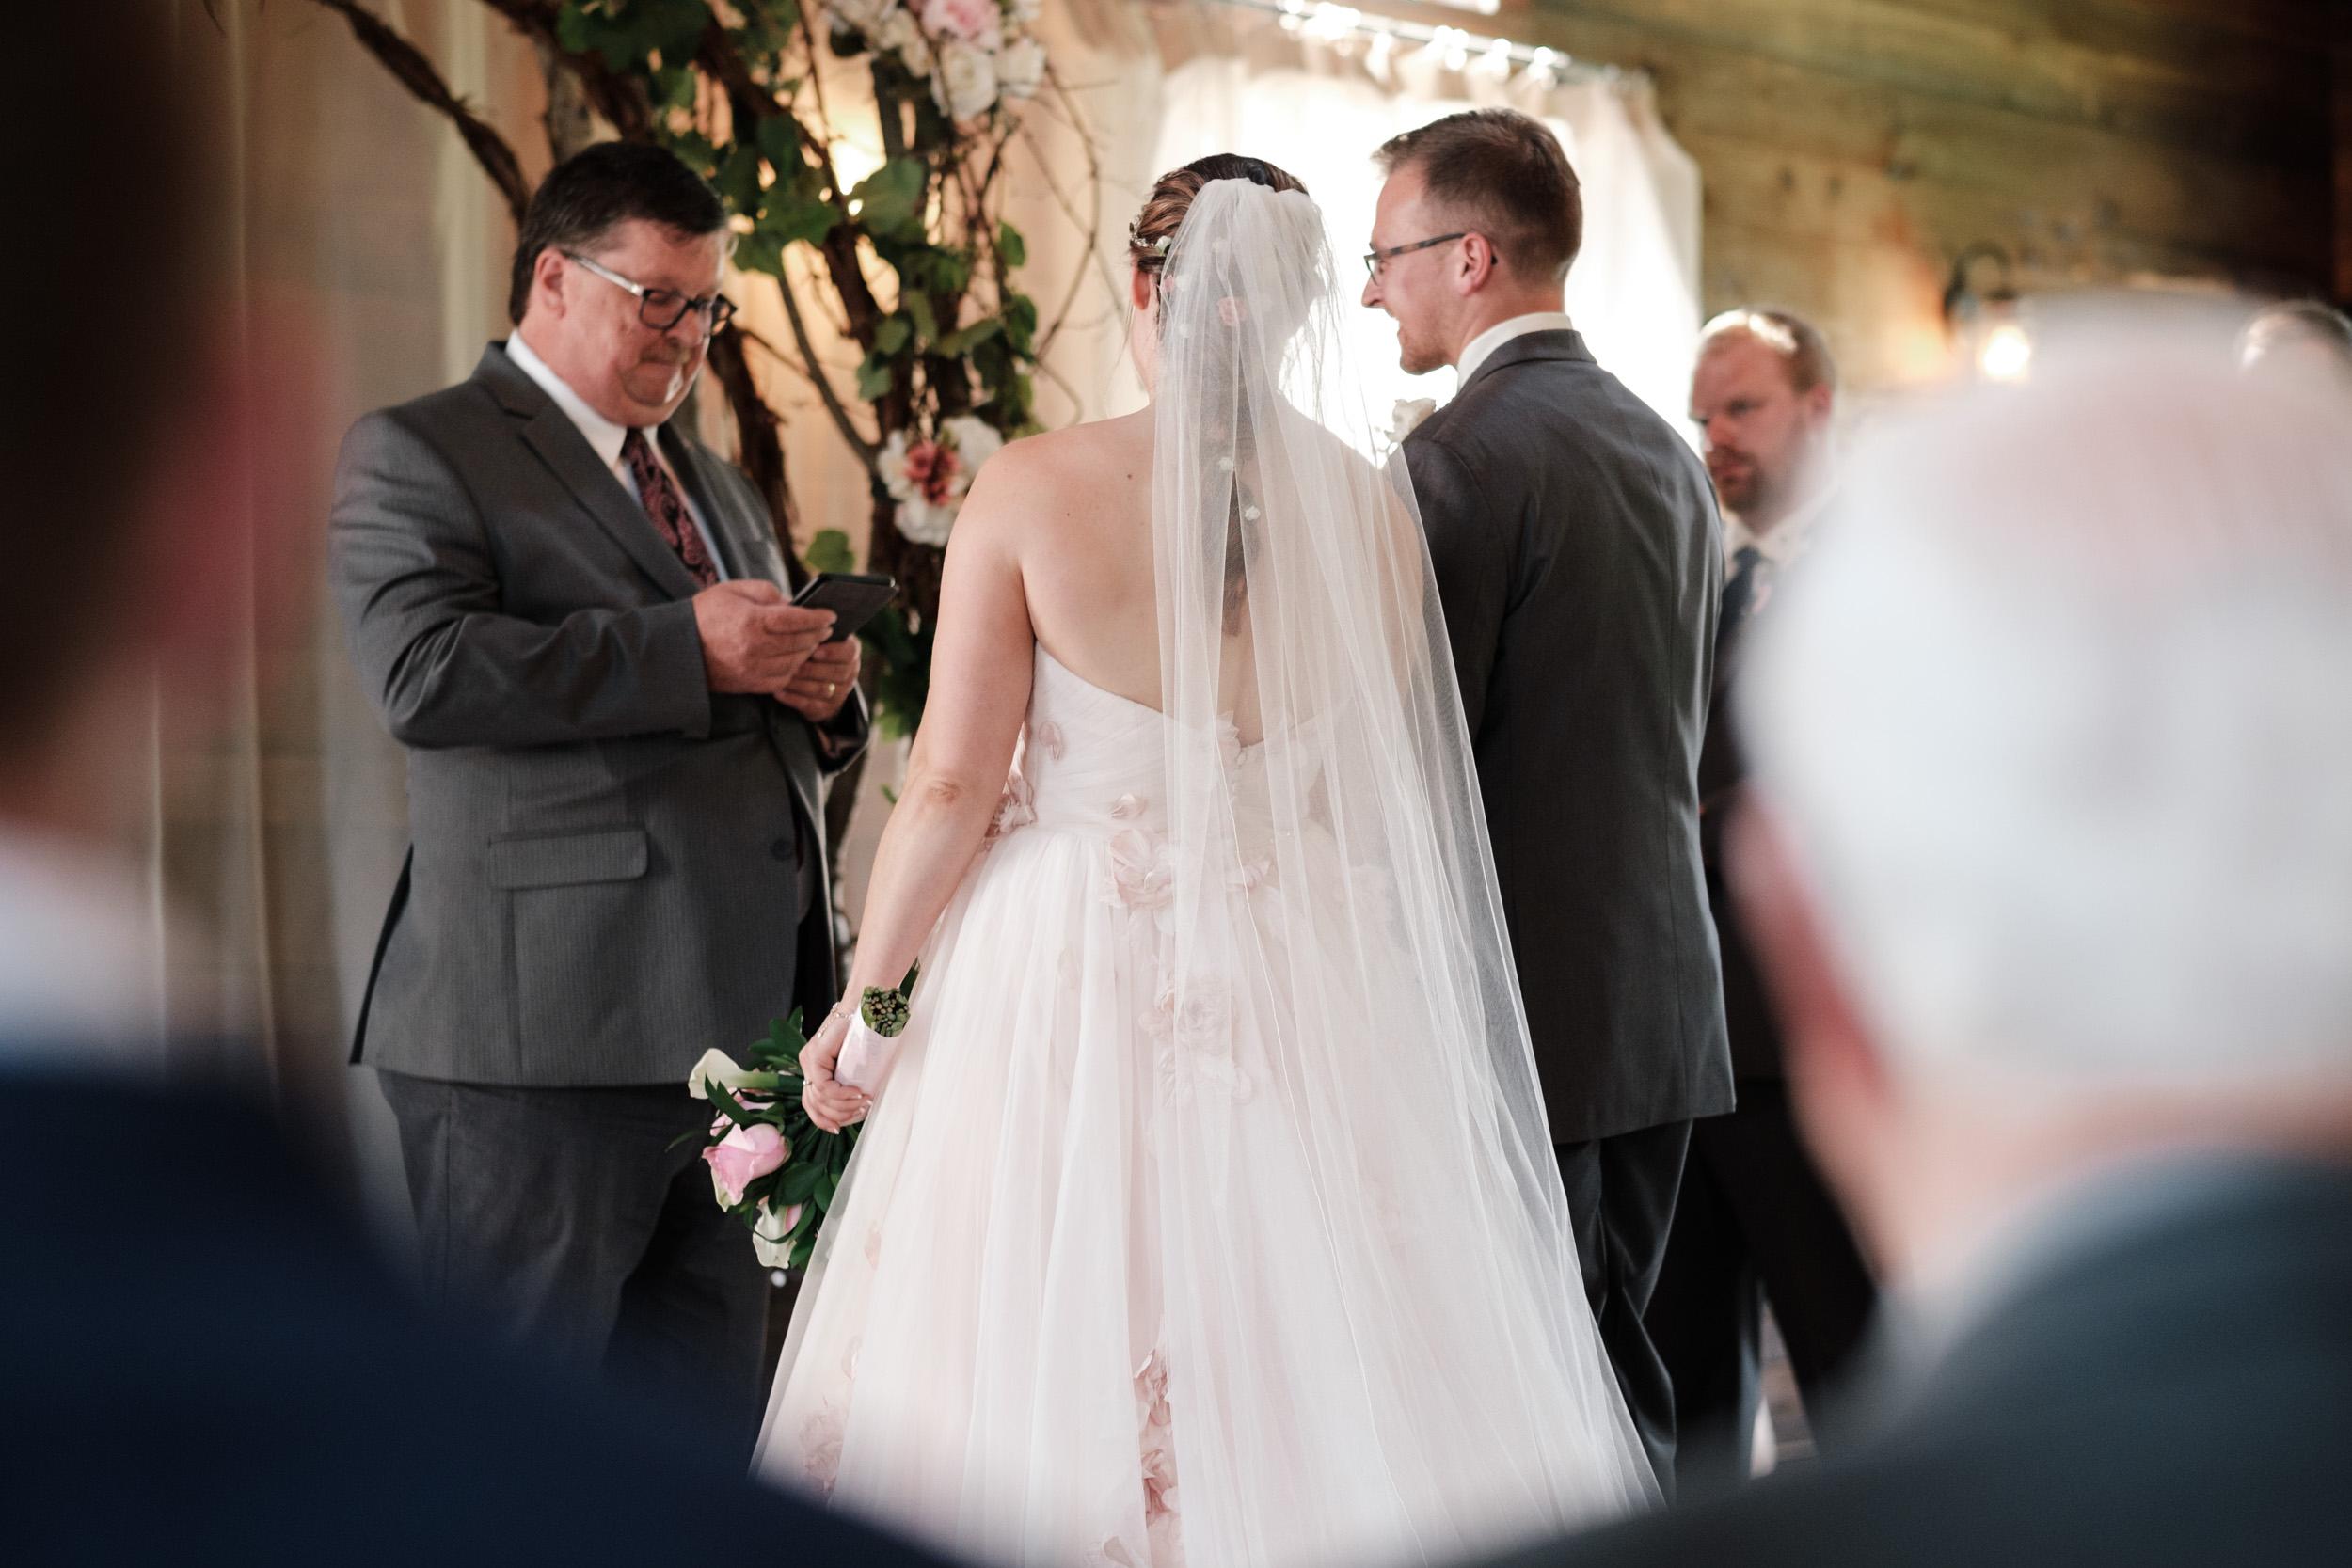 19-06-22-Ryan-Katie-The-Fields-Reserve-Wedding-32.jpg